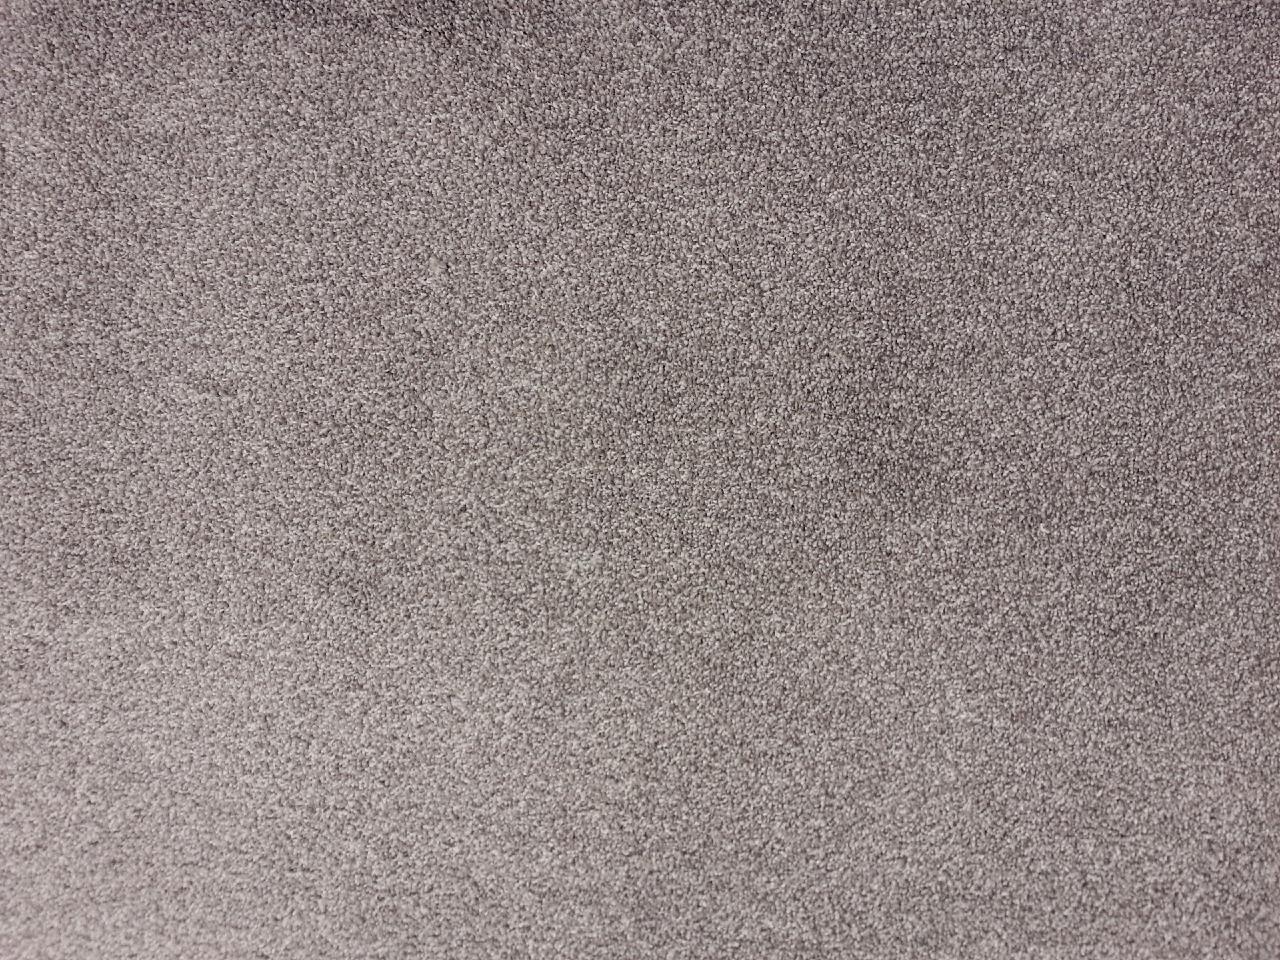 Saxony Super Deep Pile Carpet New High Quality Spend 163 60